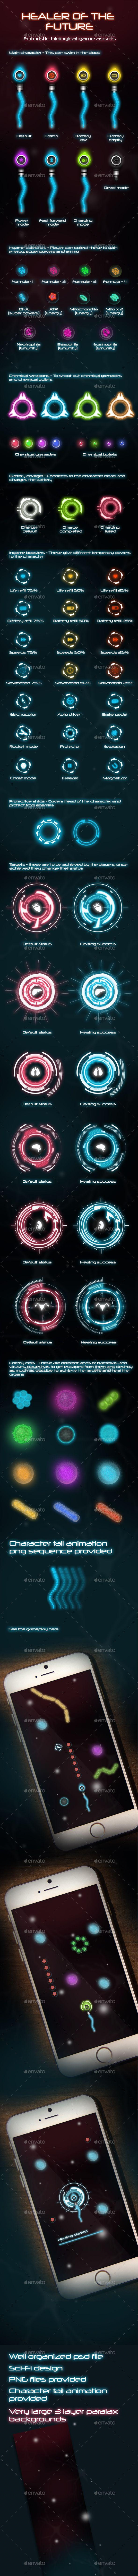 Sci-Fi Biological Game Assets